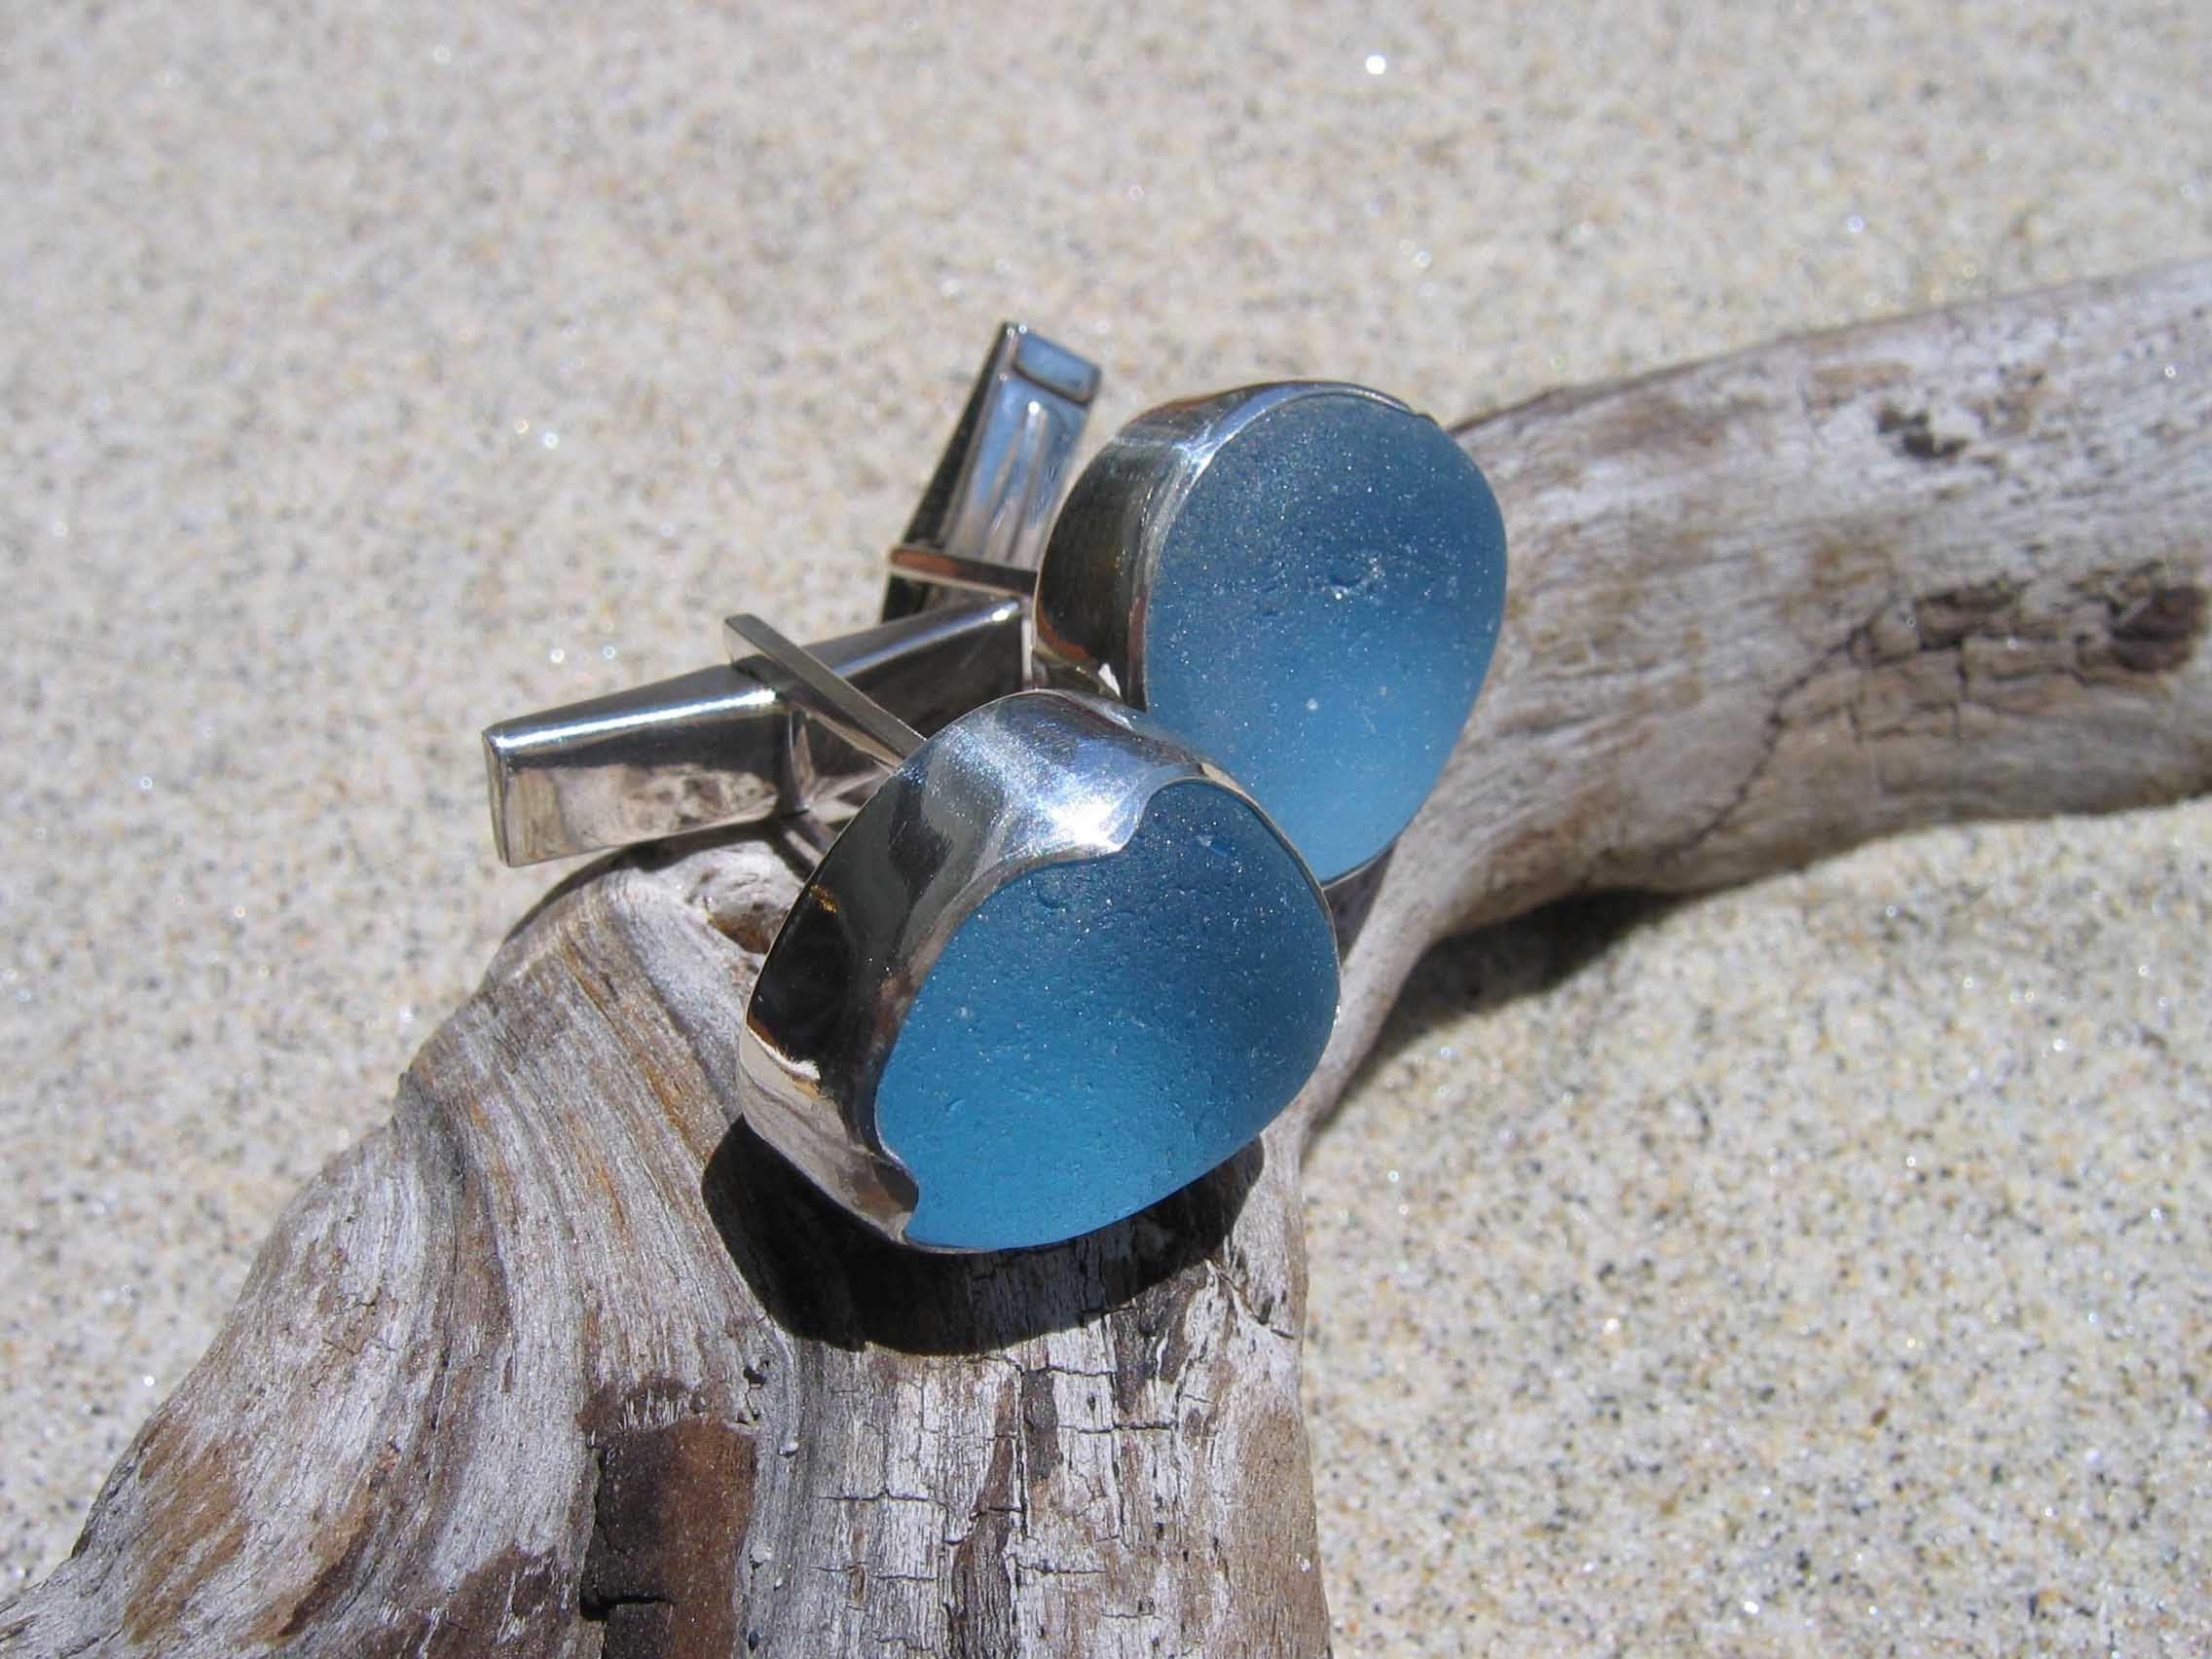 Genuine English Sea Glass Cufflinks in Cornflower Blue